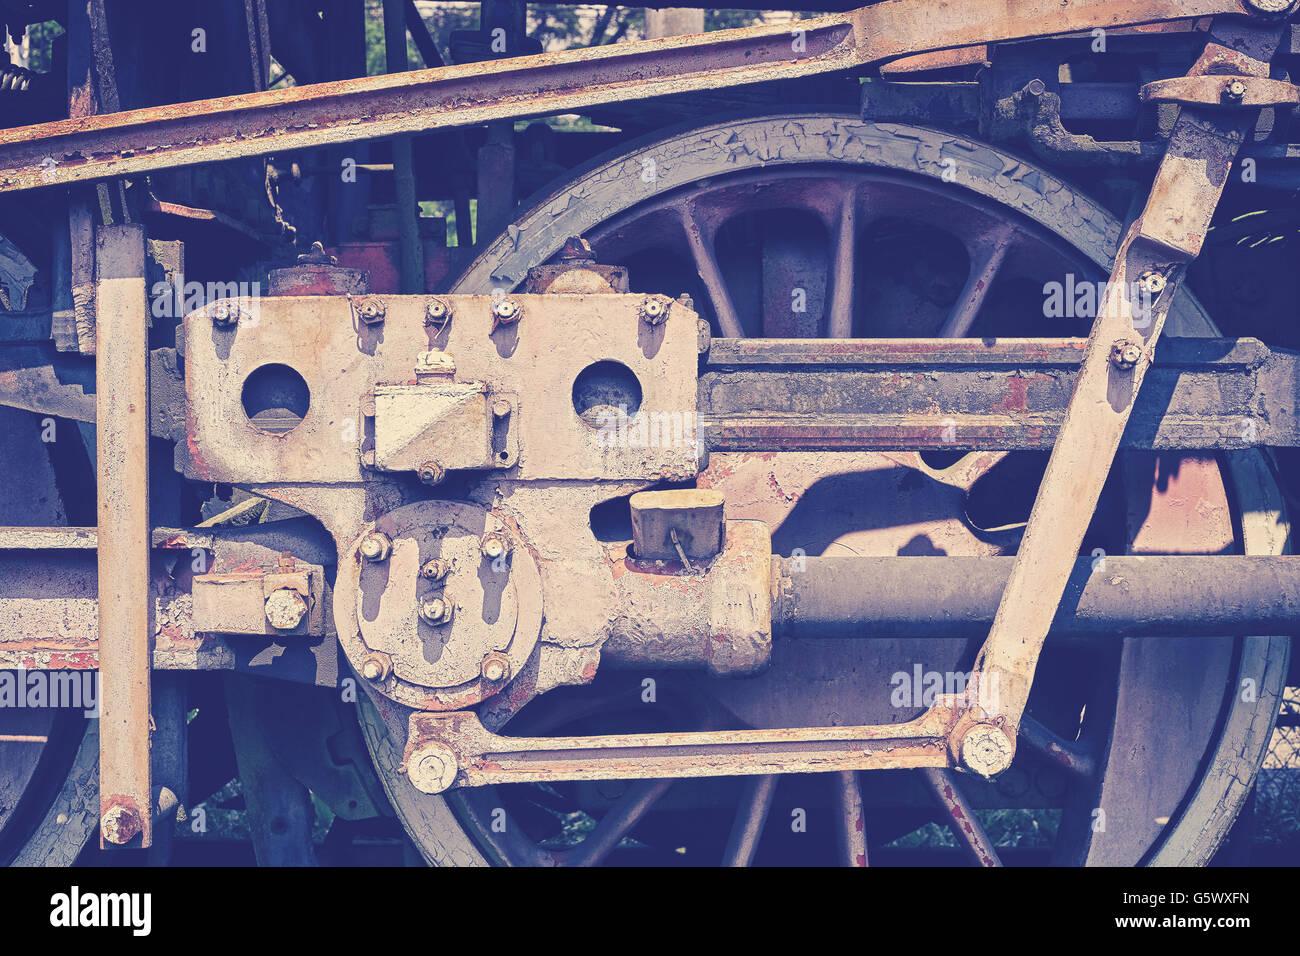 Vintage toned old rusty steam locomotive wheel. - Stock Image